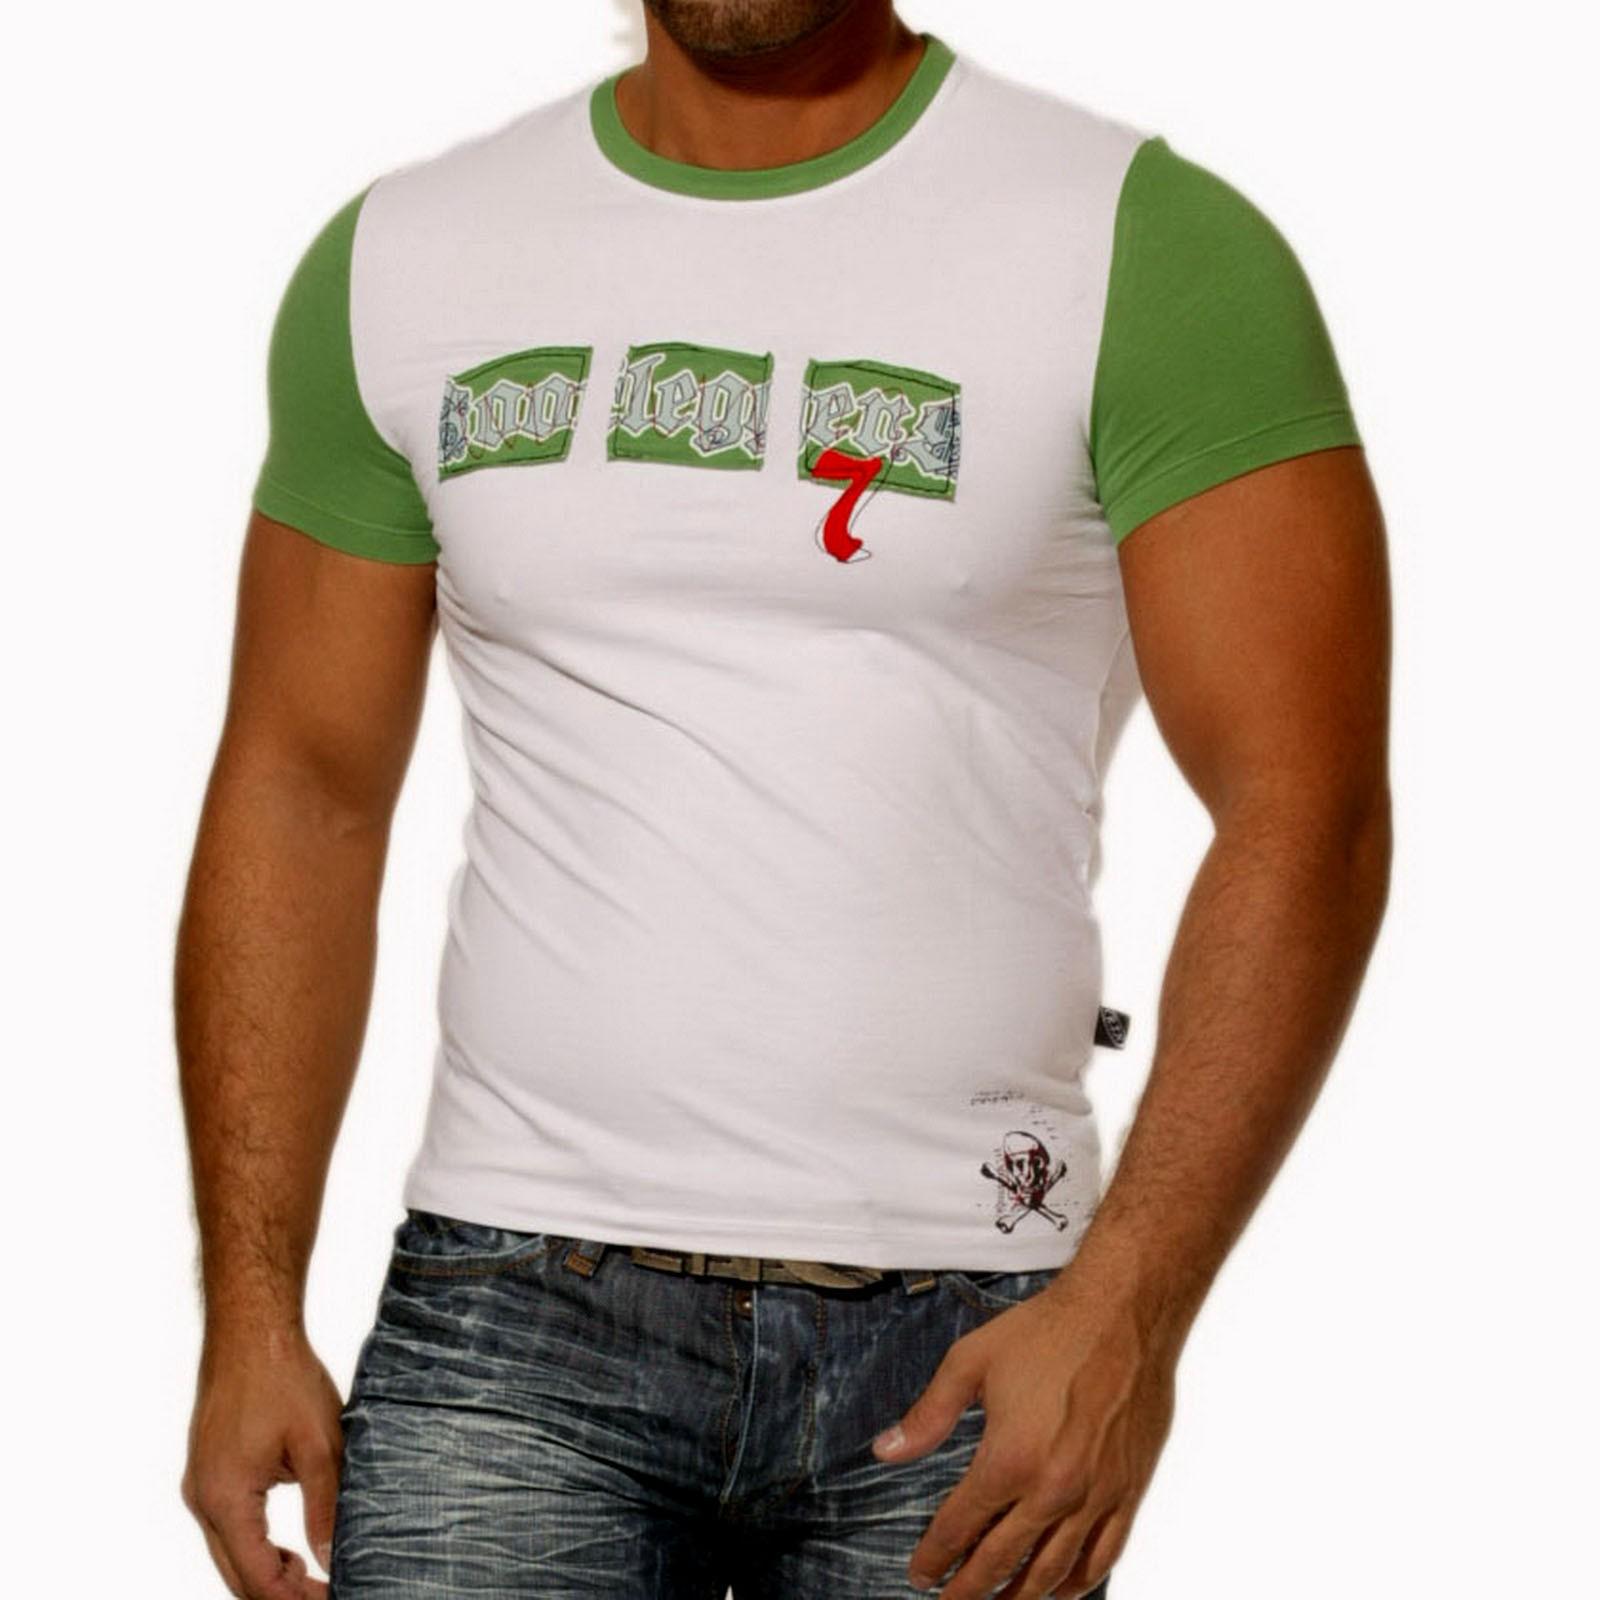 T-Shirt Weiß 713 Rusty Neal